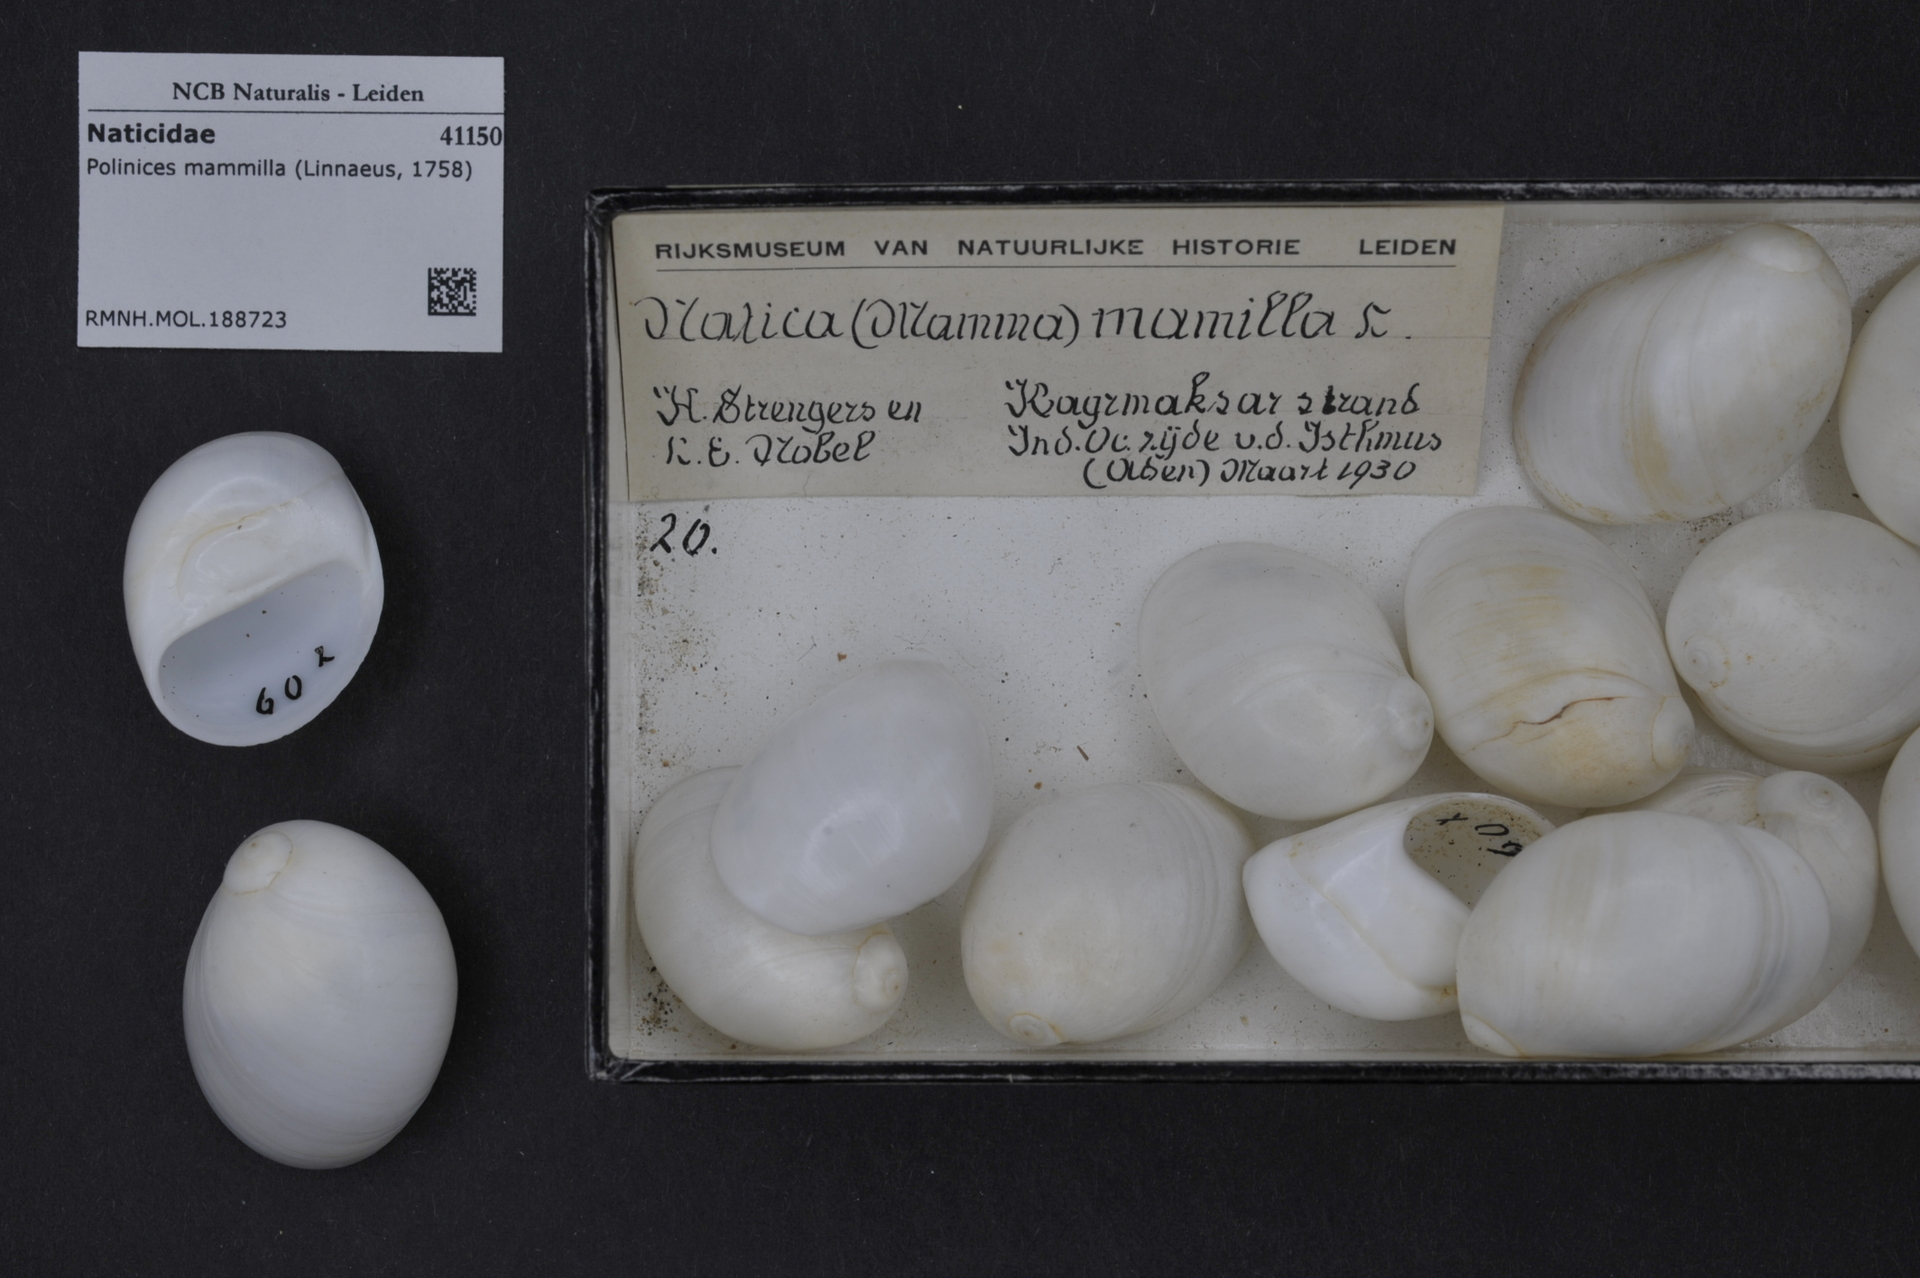 RMNH.MOL.188723 | Polinices mammilla (Linnaeus, 1758)